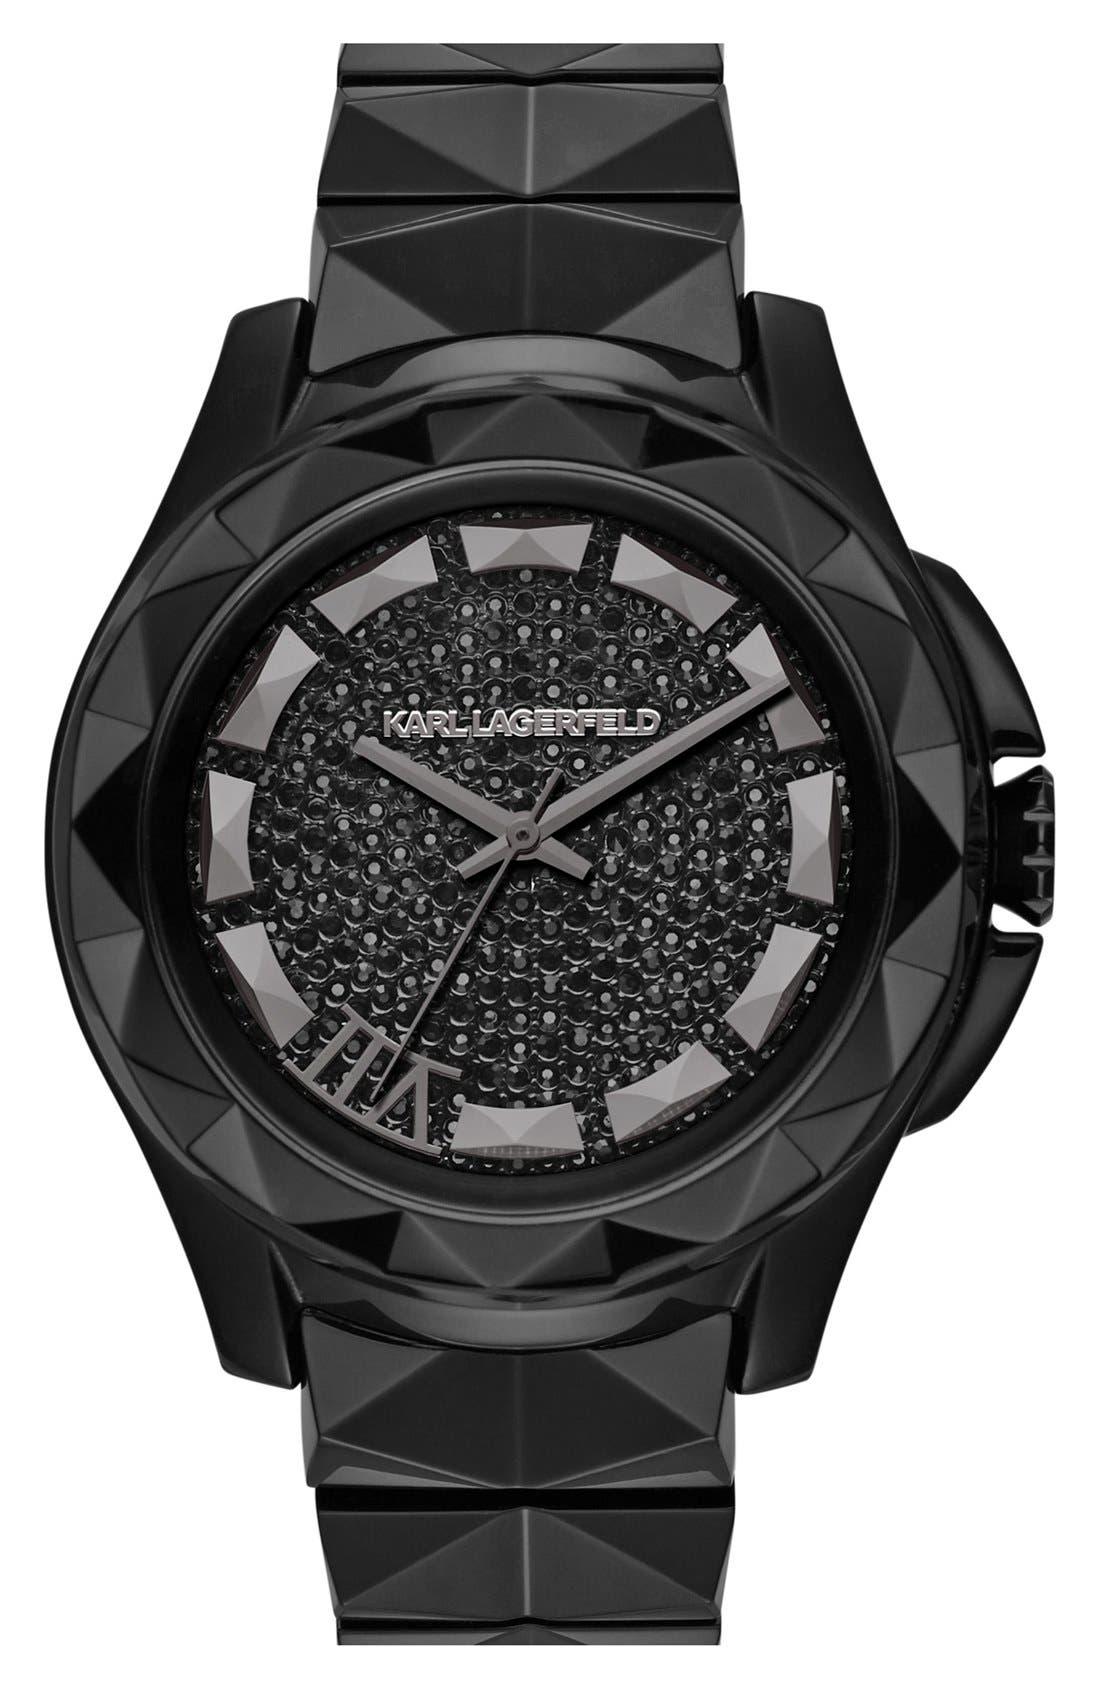 Main Image - KARL LAGERFELD '7' Faceted Bezel Ceramic Bracelet Watch, 44mm